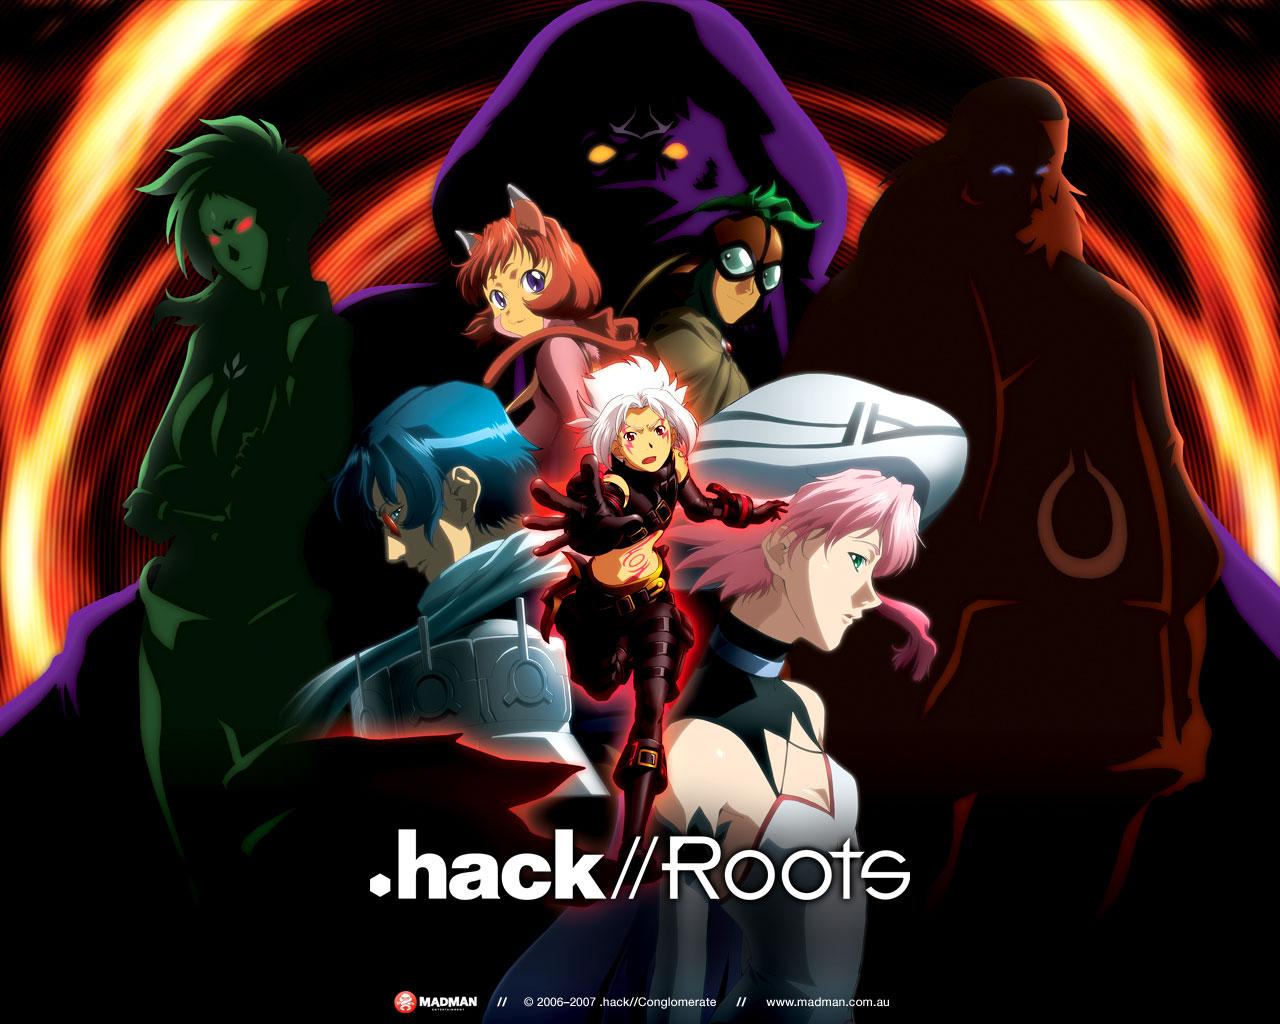 Free Download Hackroots Images Hackroots Hd Wallpaper And